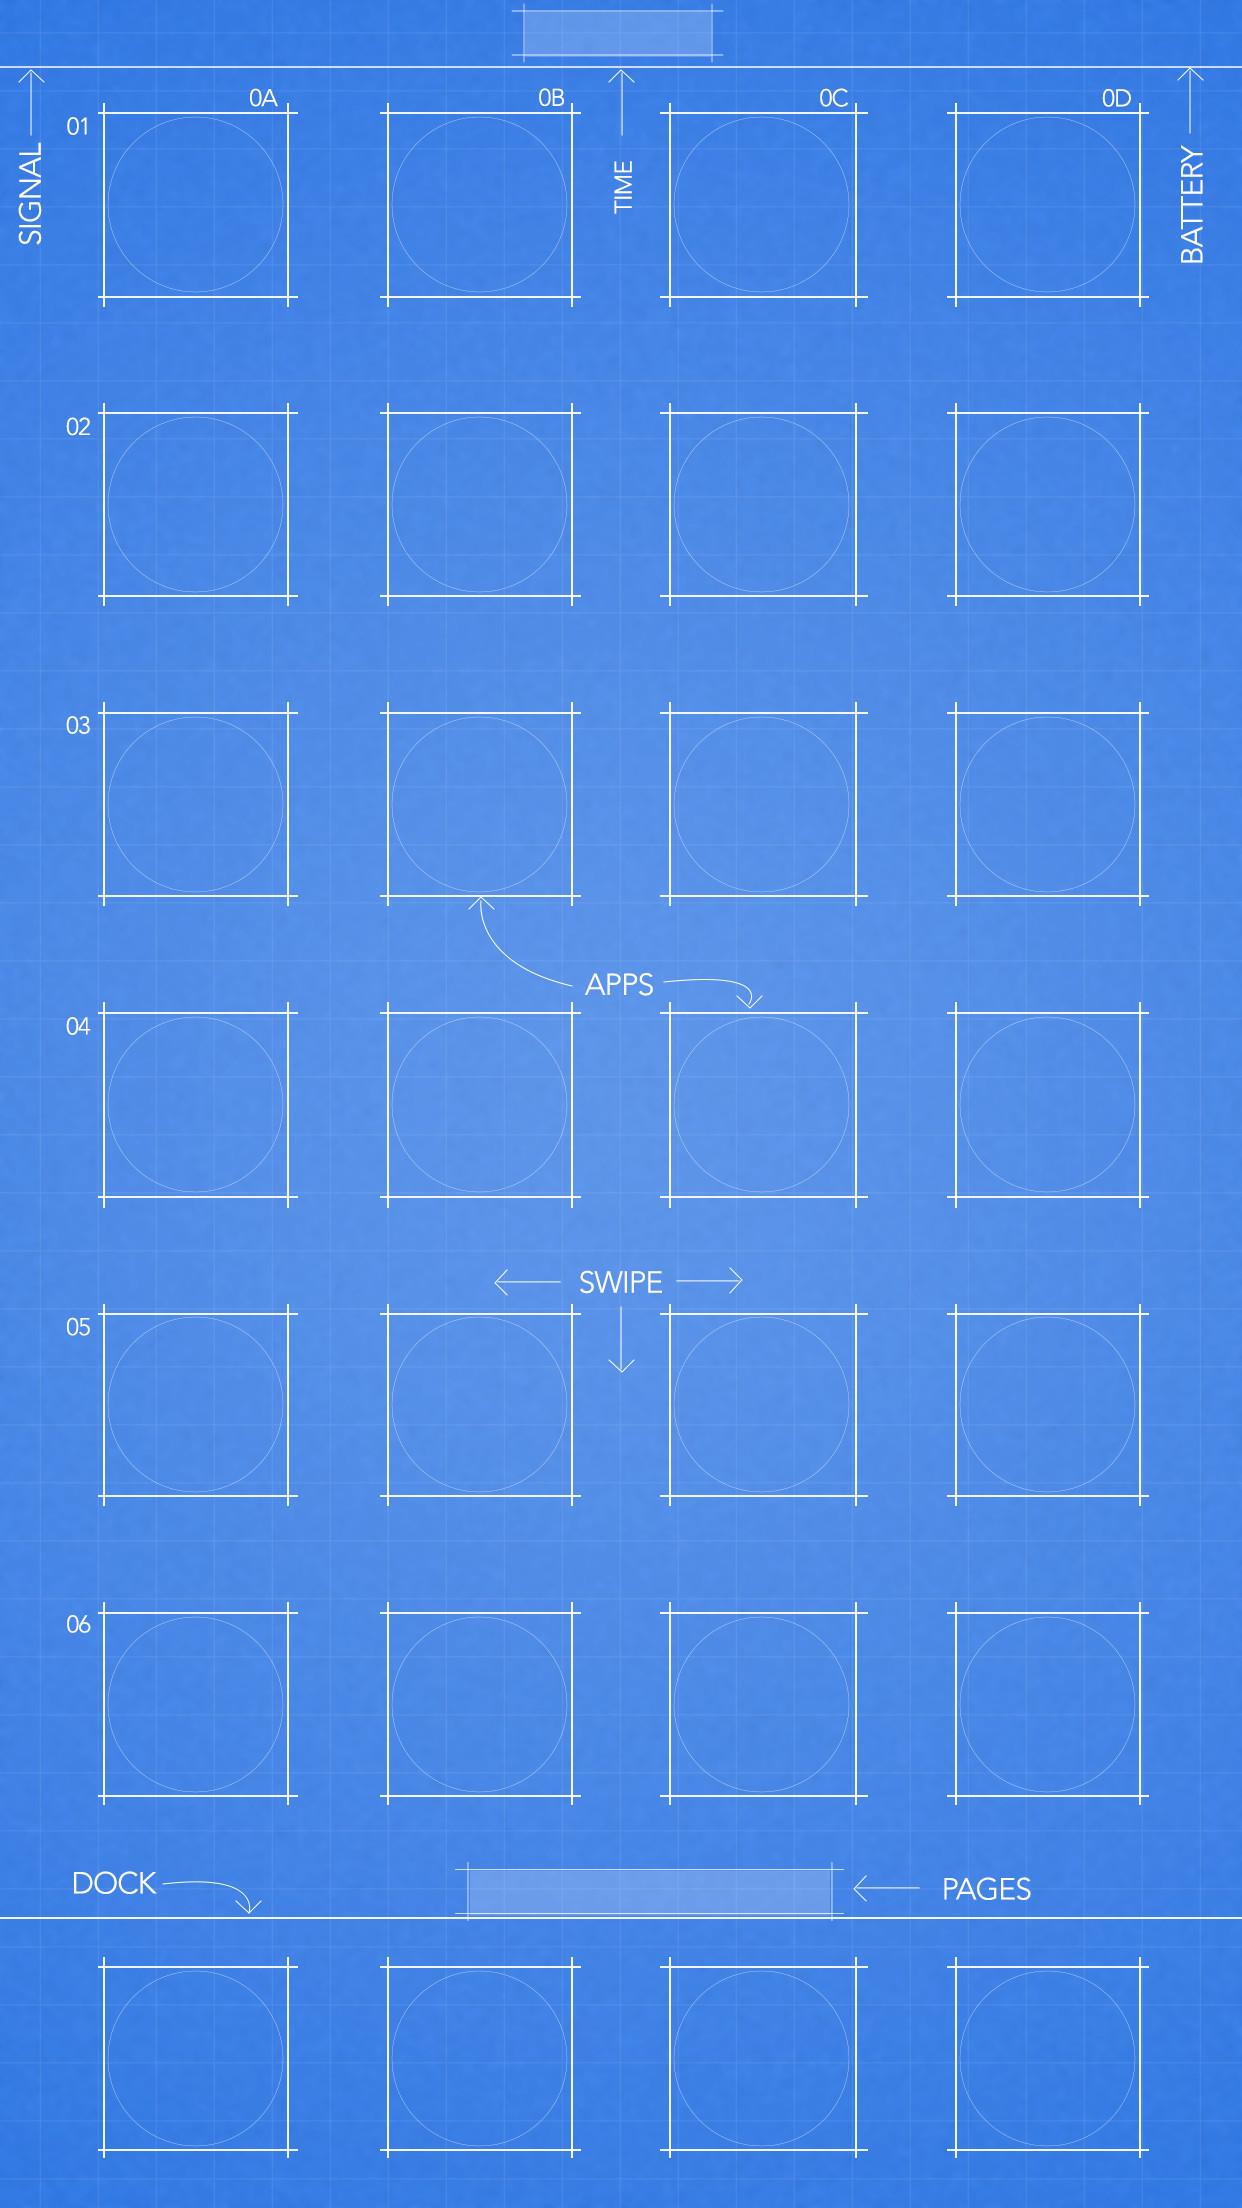 Desktop Icon Shelf Wallpaper 66 images